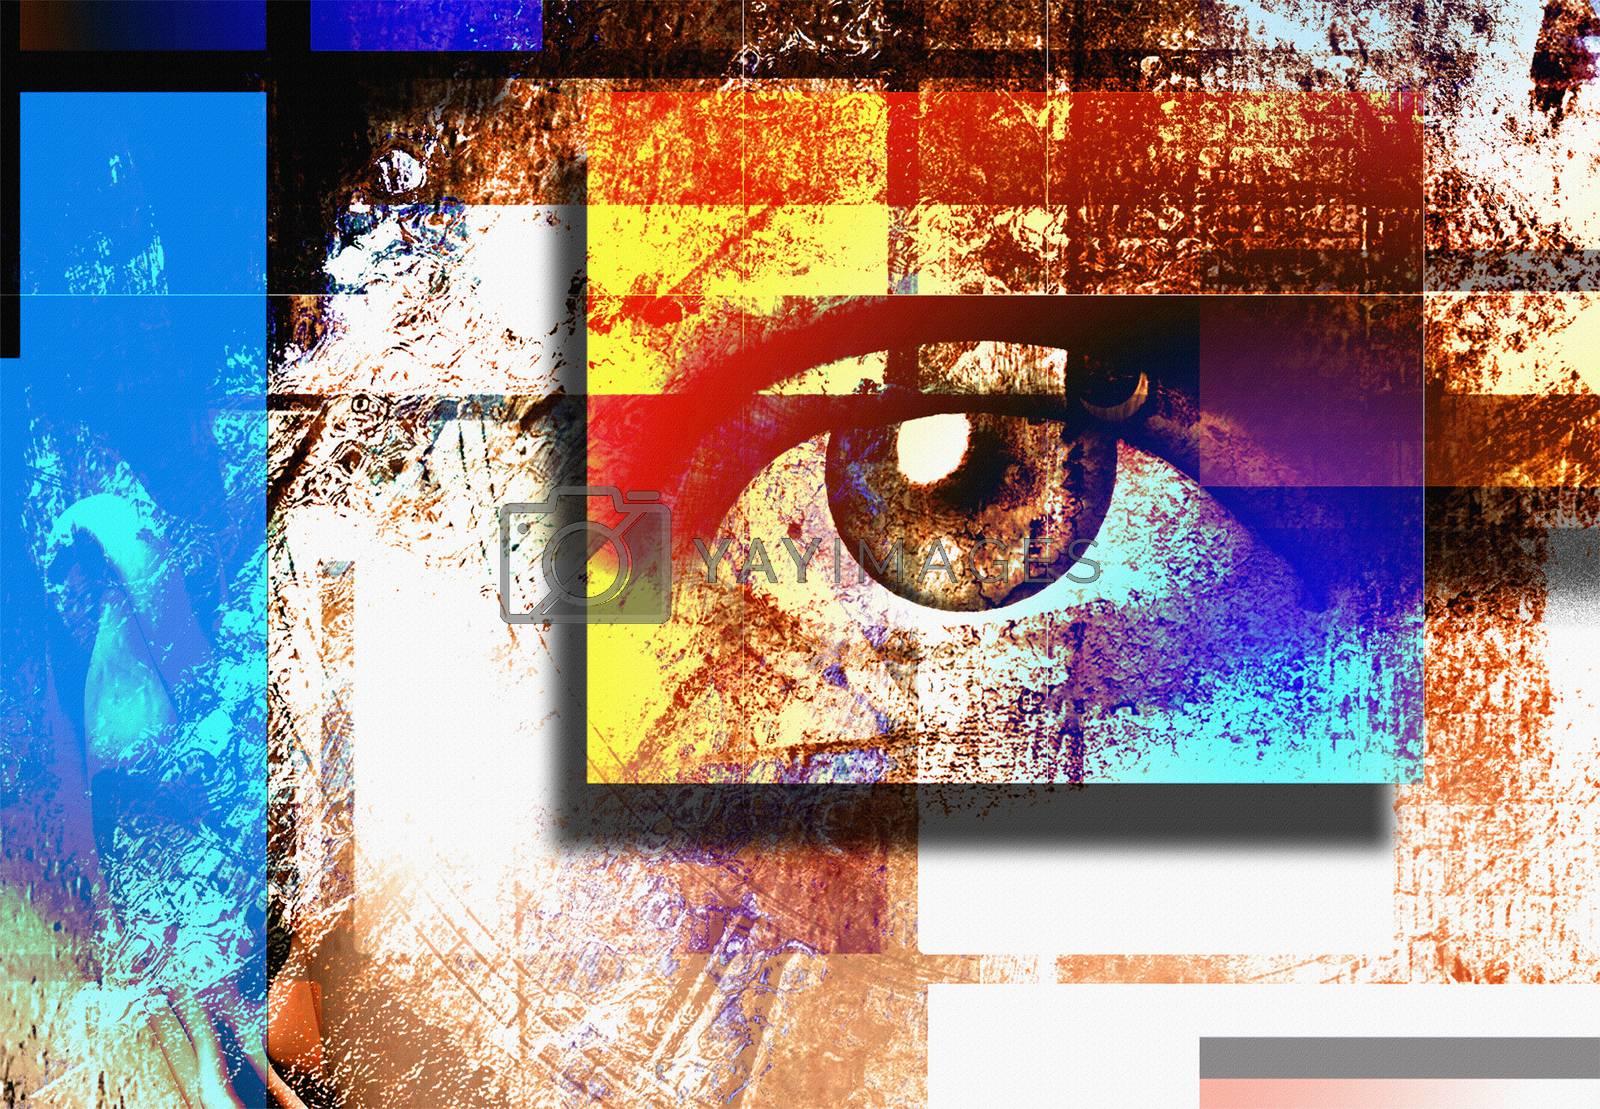 Surreal digital art. Human's eye. Mondrian style.